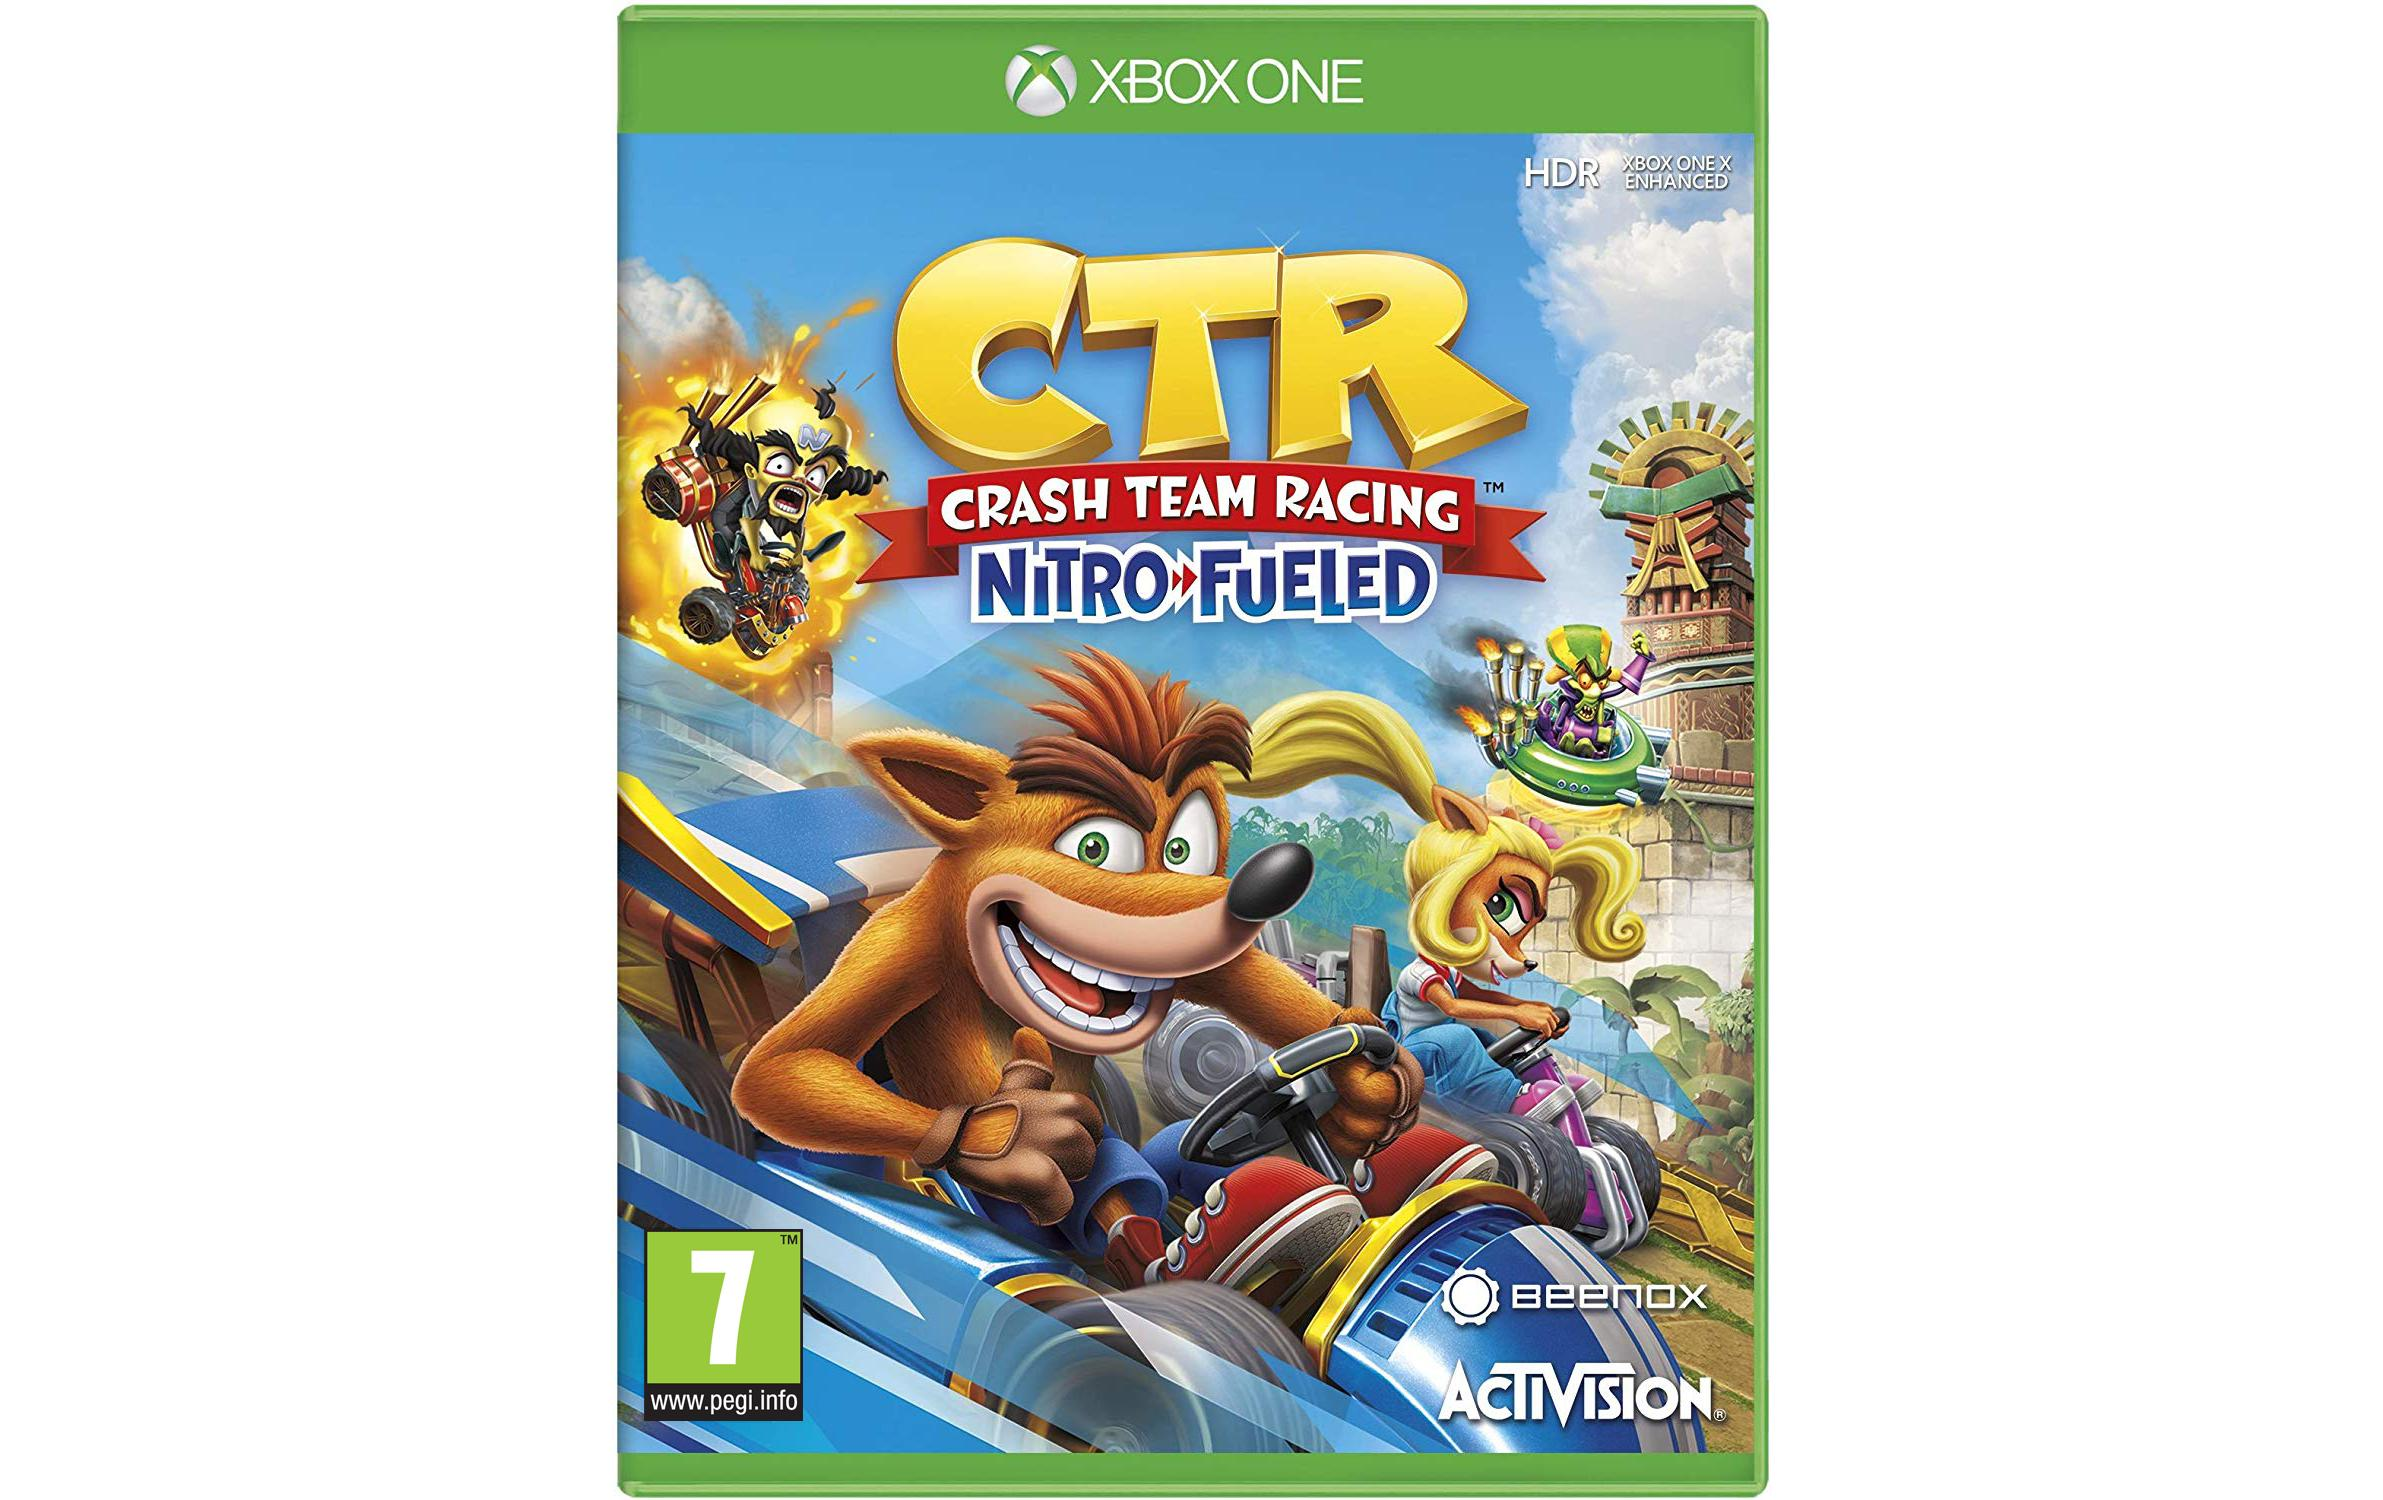 Image of Blizzard Crash Team Racing: Nitro-Fueled, Activision